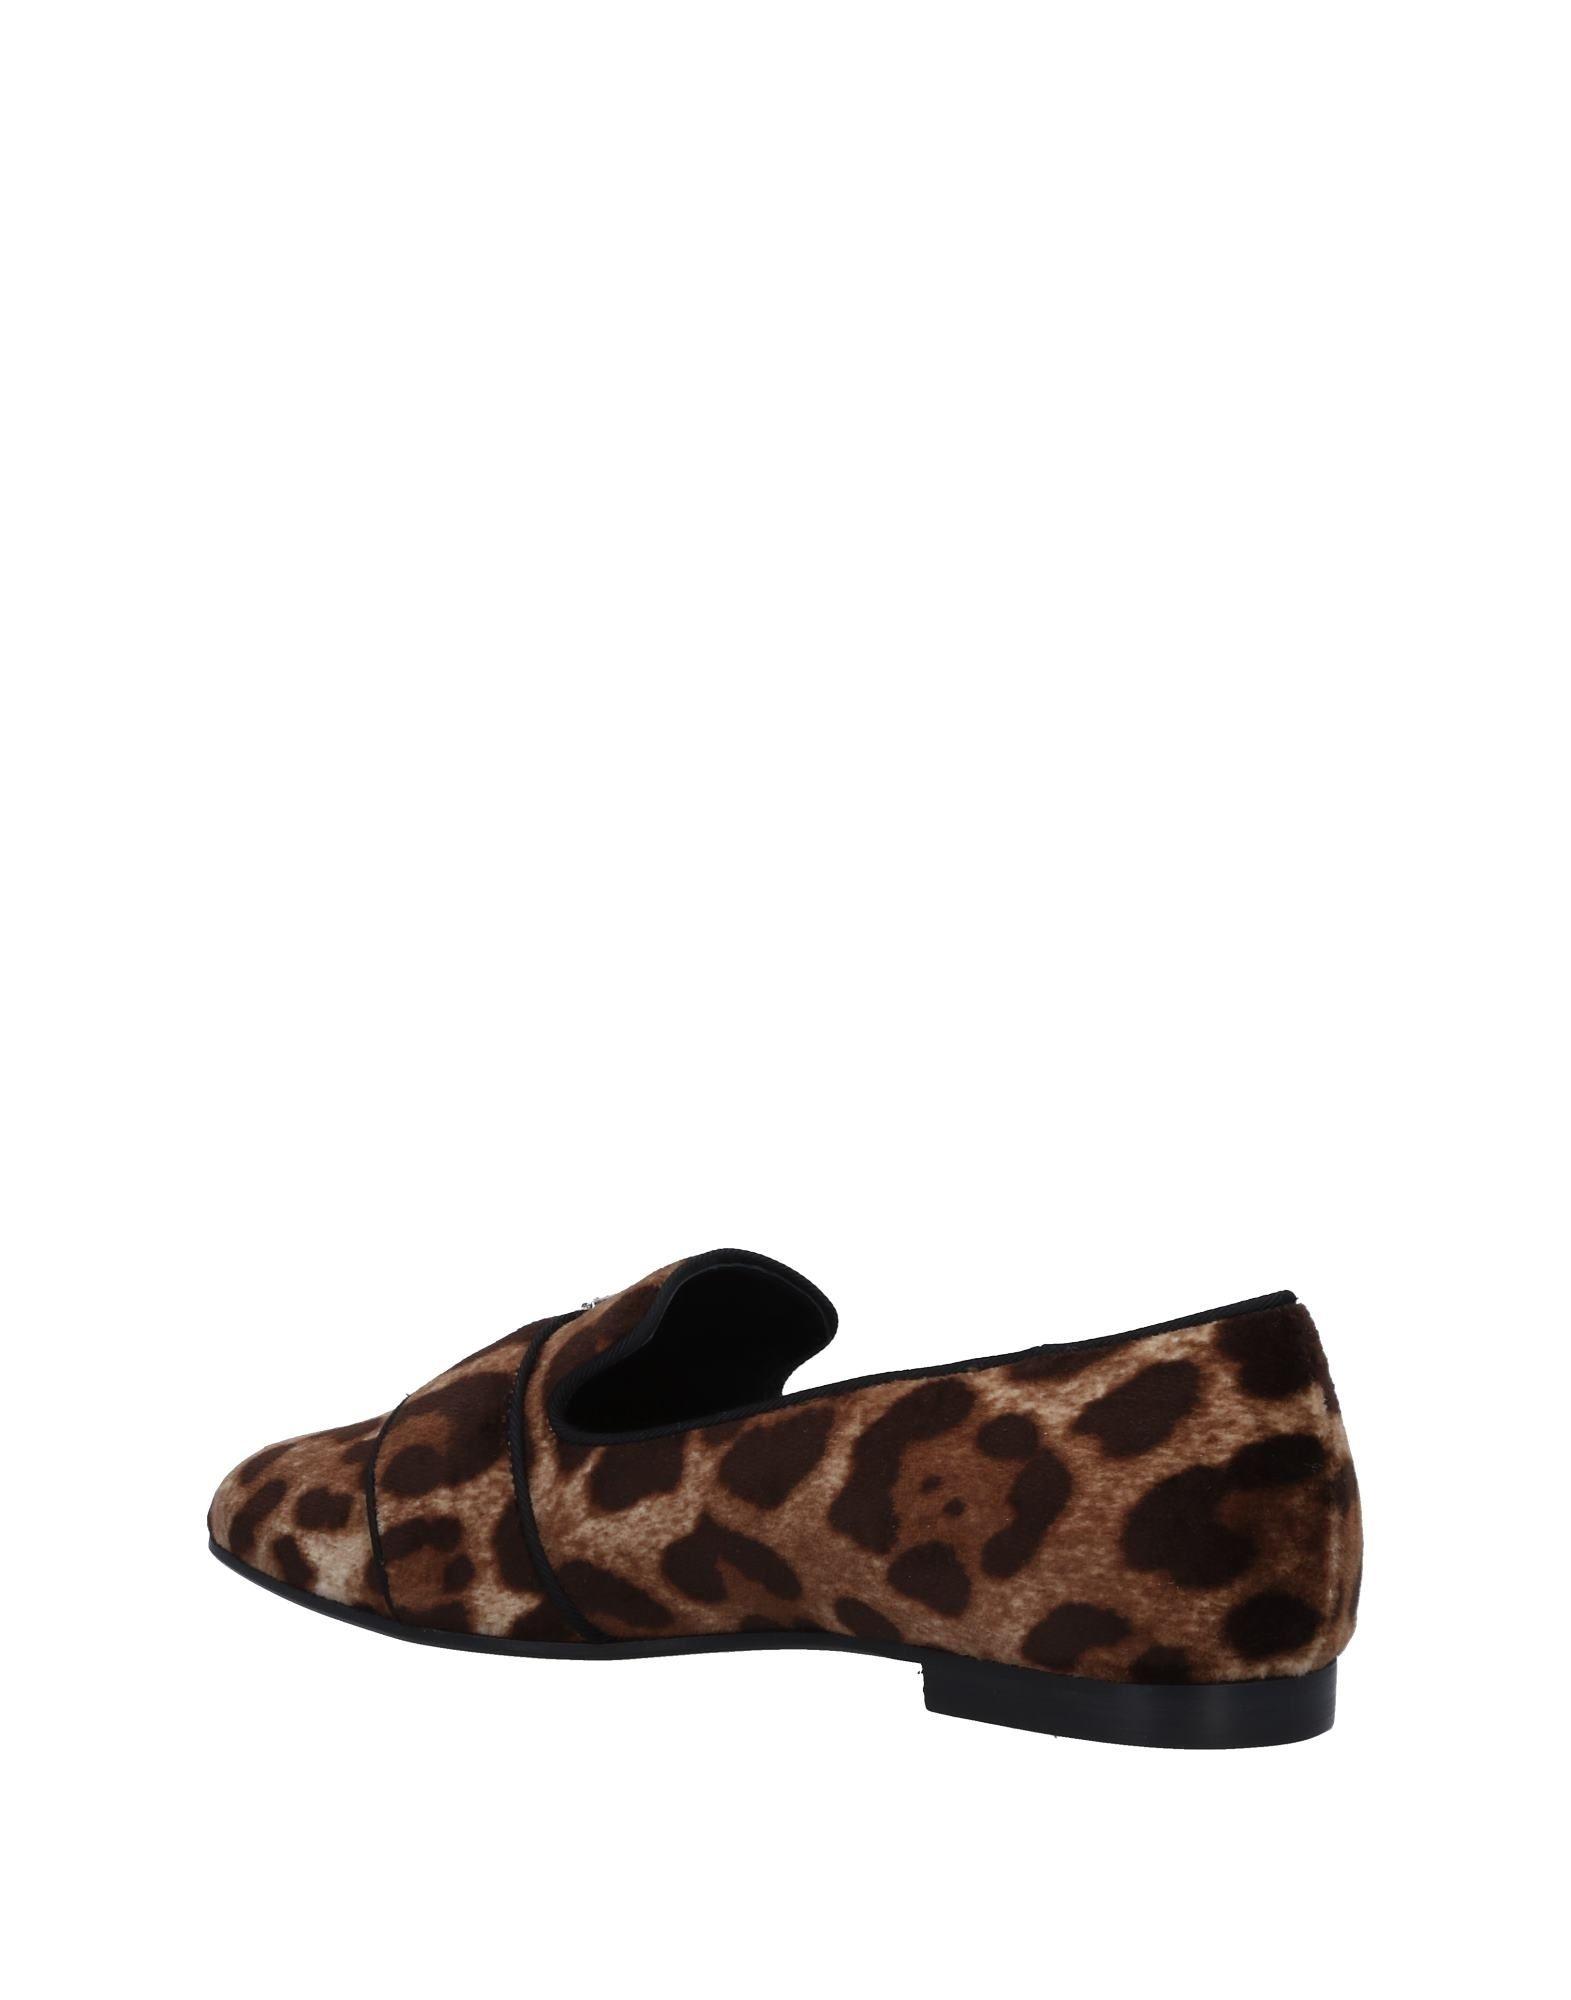 Dolce & Gabbana Mokassins Damen Schuhe  11495668VR Neue Schuhe Damen 992280